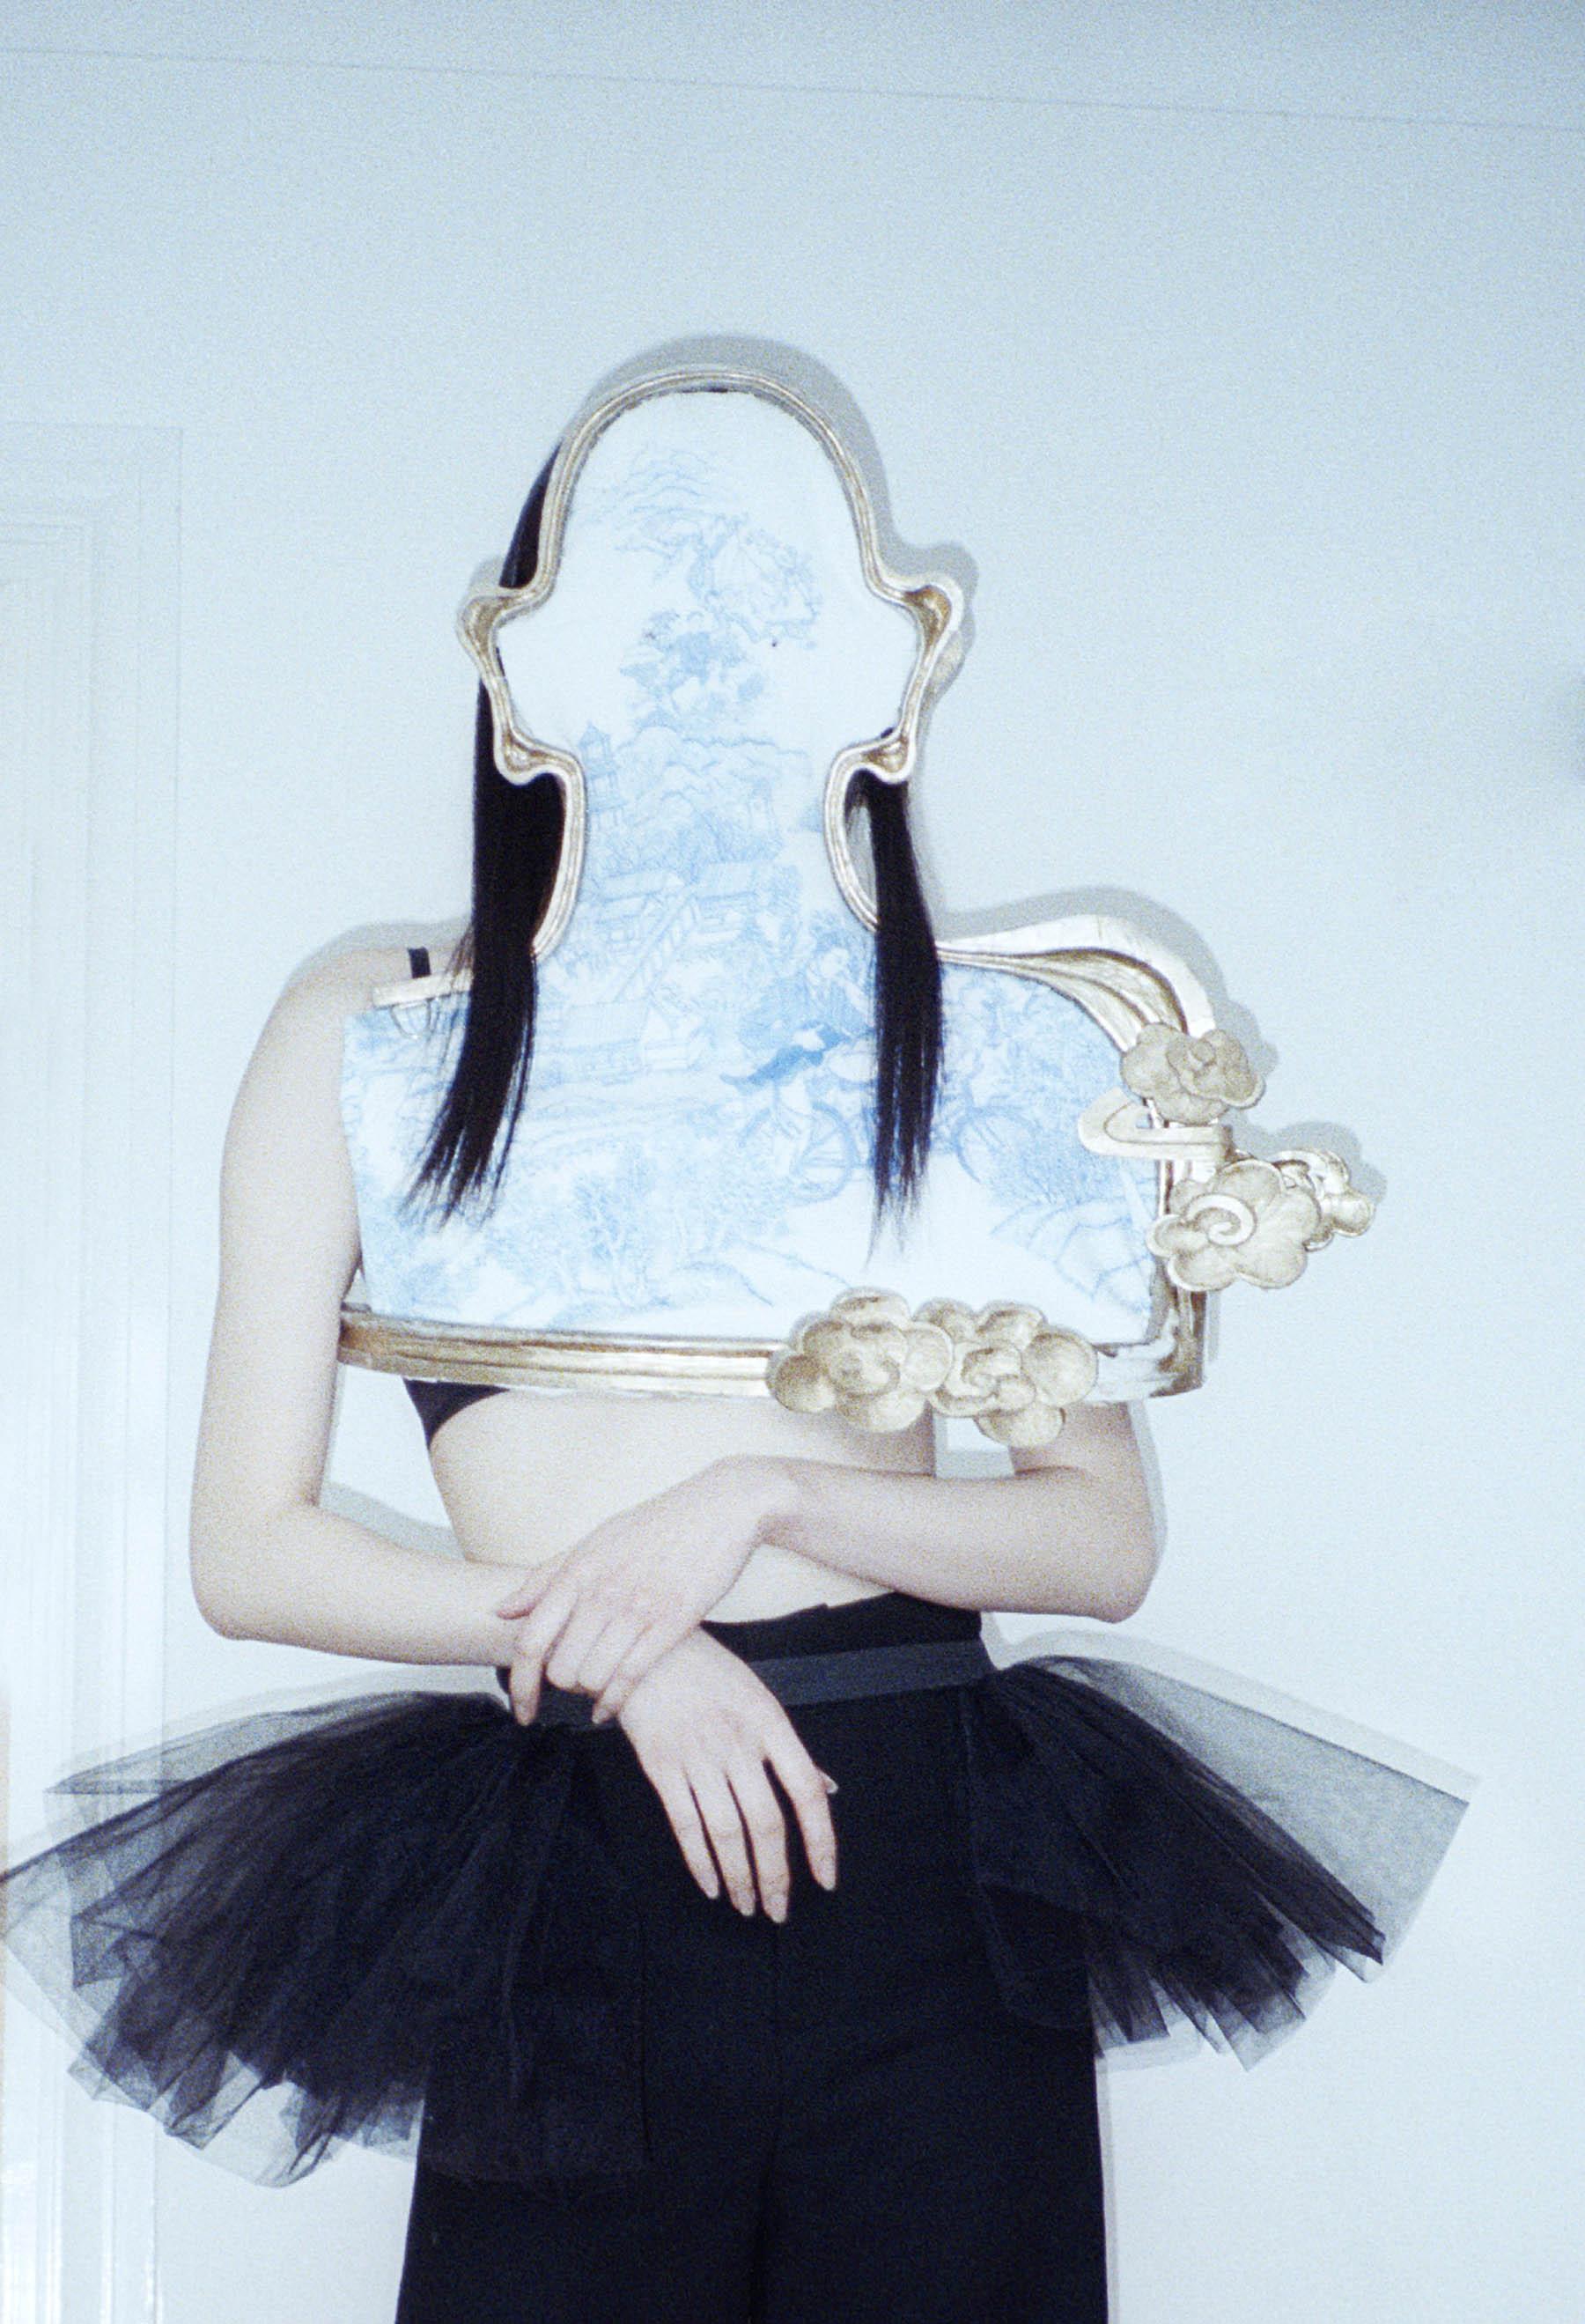 iGNANT-Editorial-Natasha-Fava-Tactile-Misadventures-003